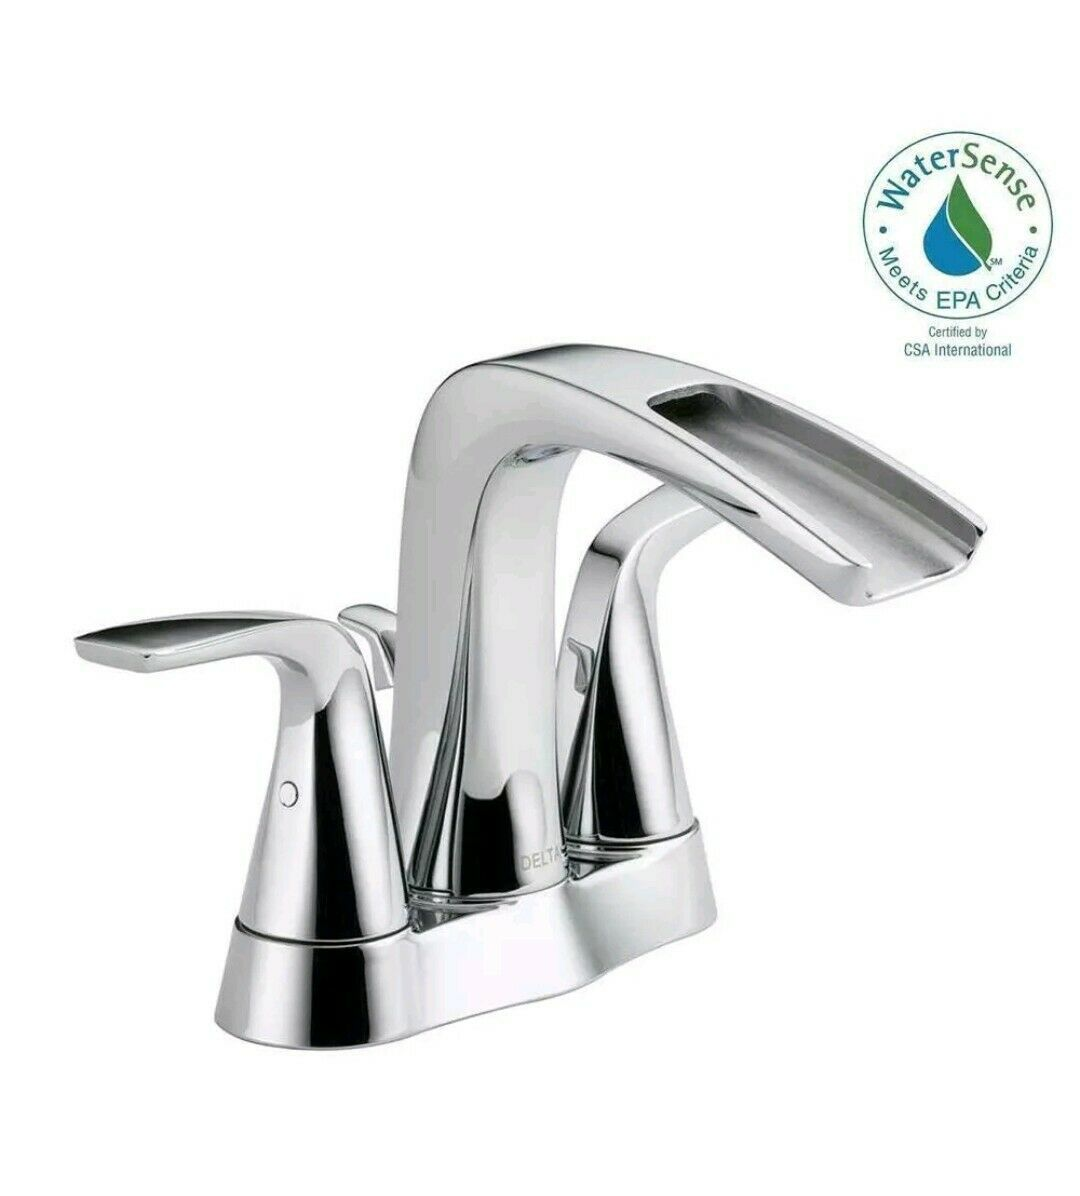 Details About Delta Bathroom Faucet 25724lf Eco Tolva 4 In 2